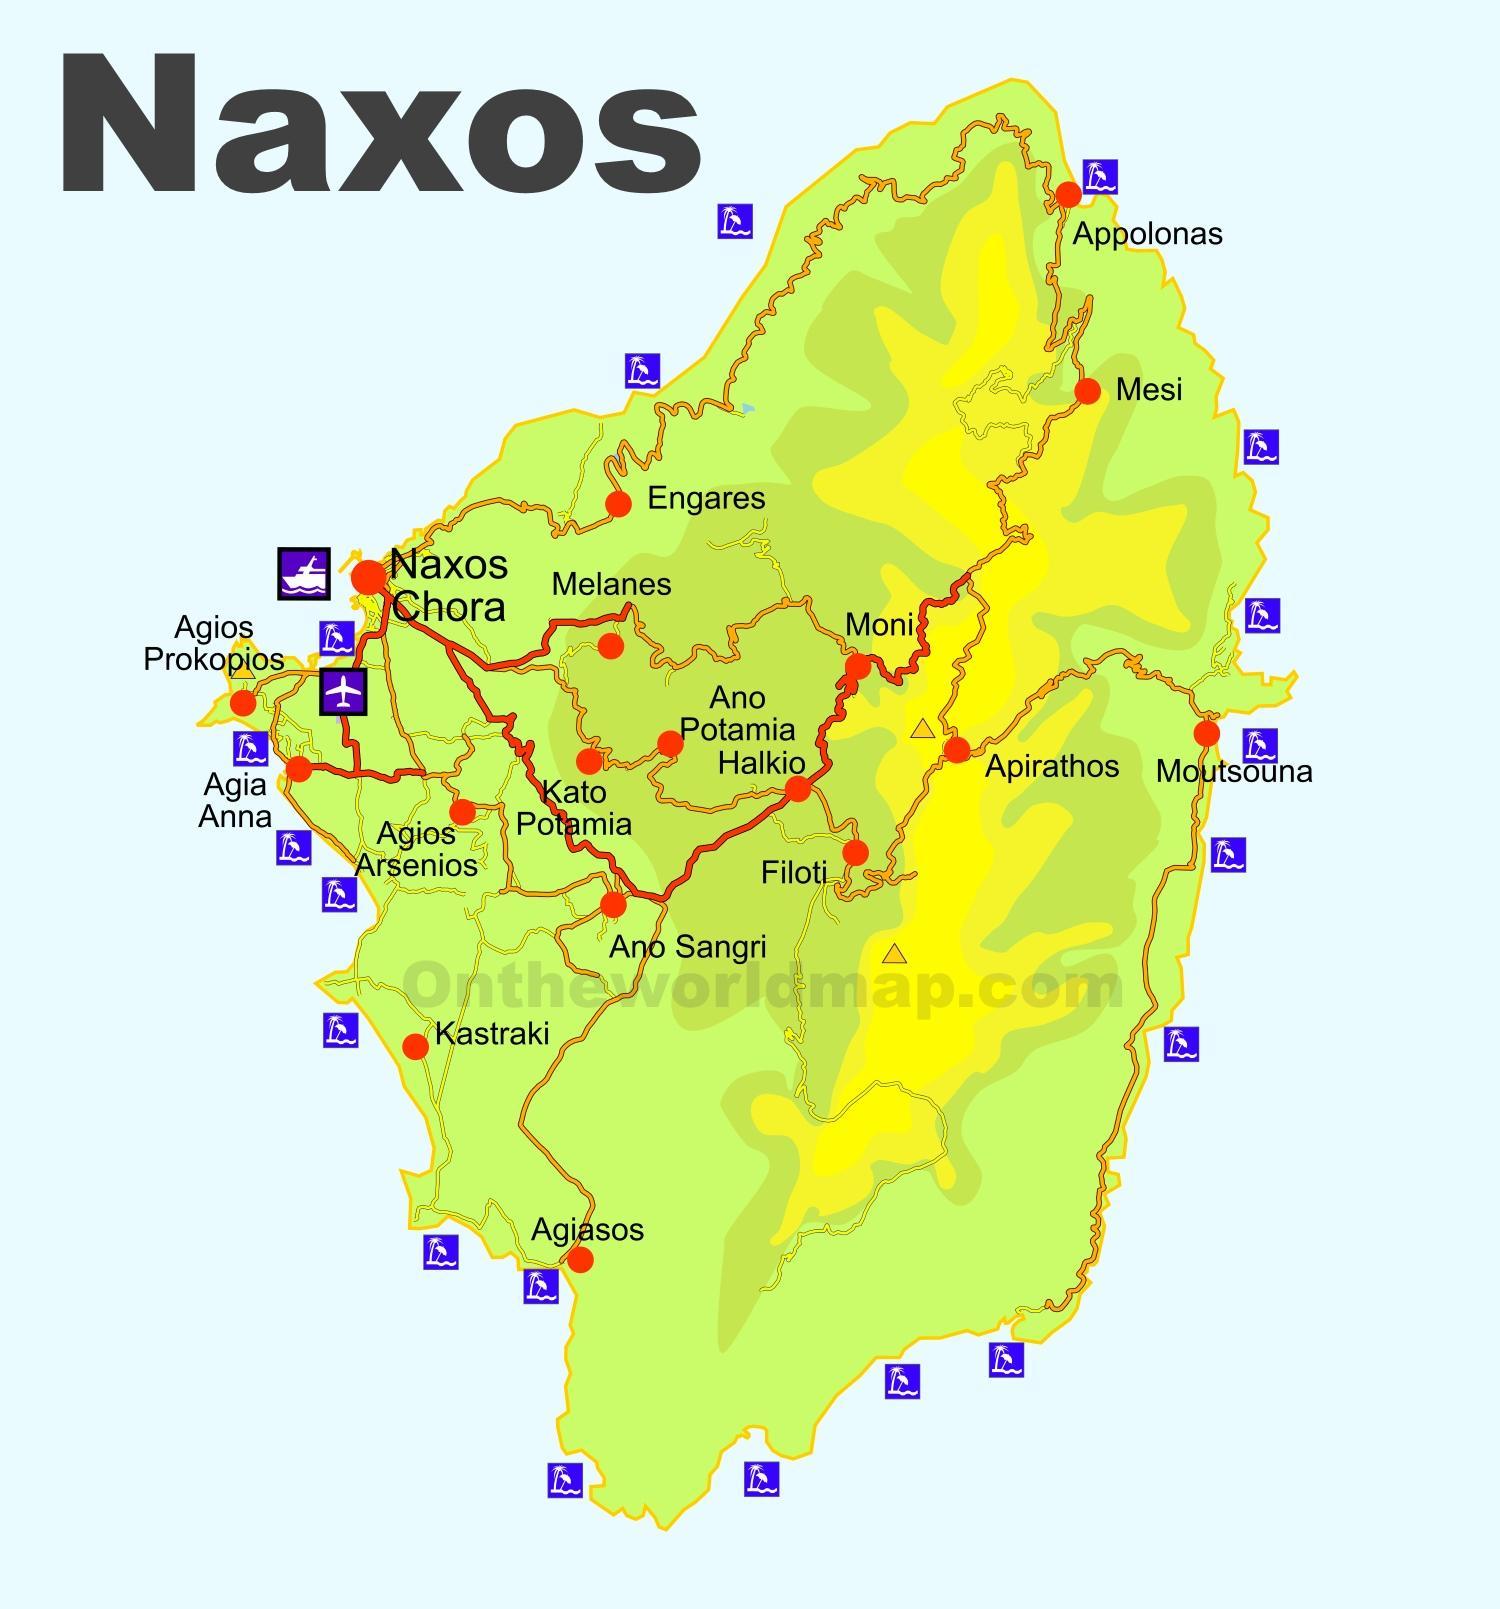 naxos karte griechenland Naxos, Griechenland Karte   Karte von Naxos Griechenland (Europa